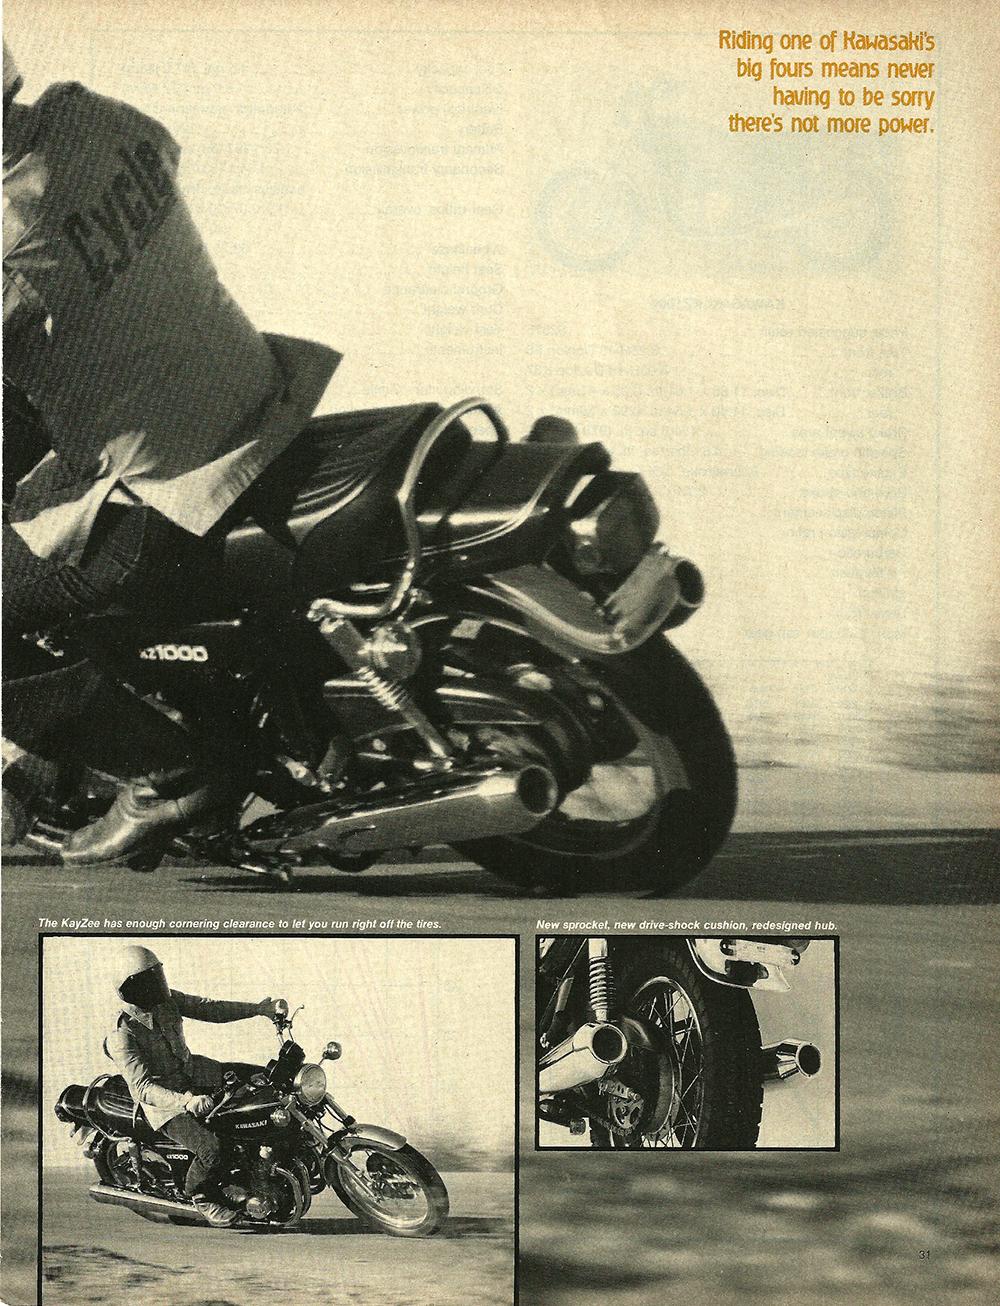 1977 Kawasaki KZ1000 road test 4.jpg